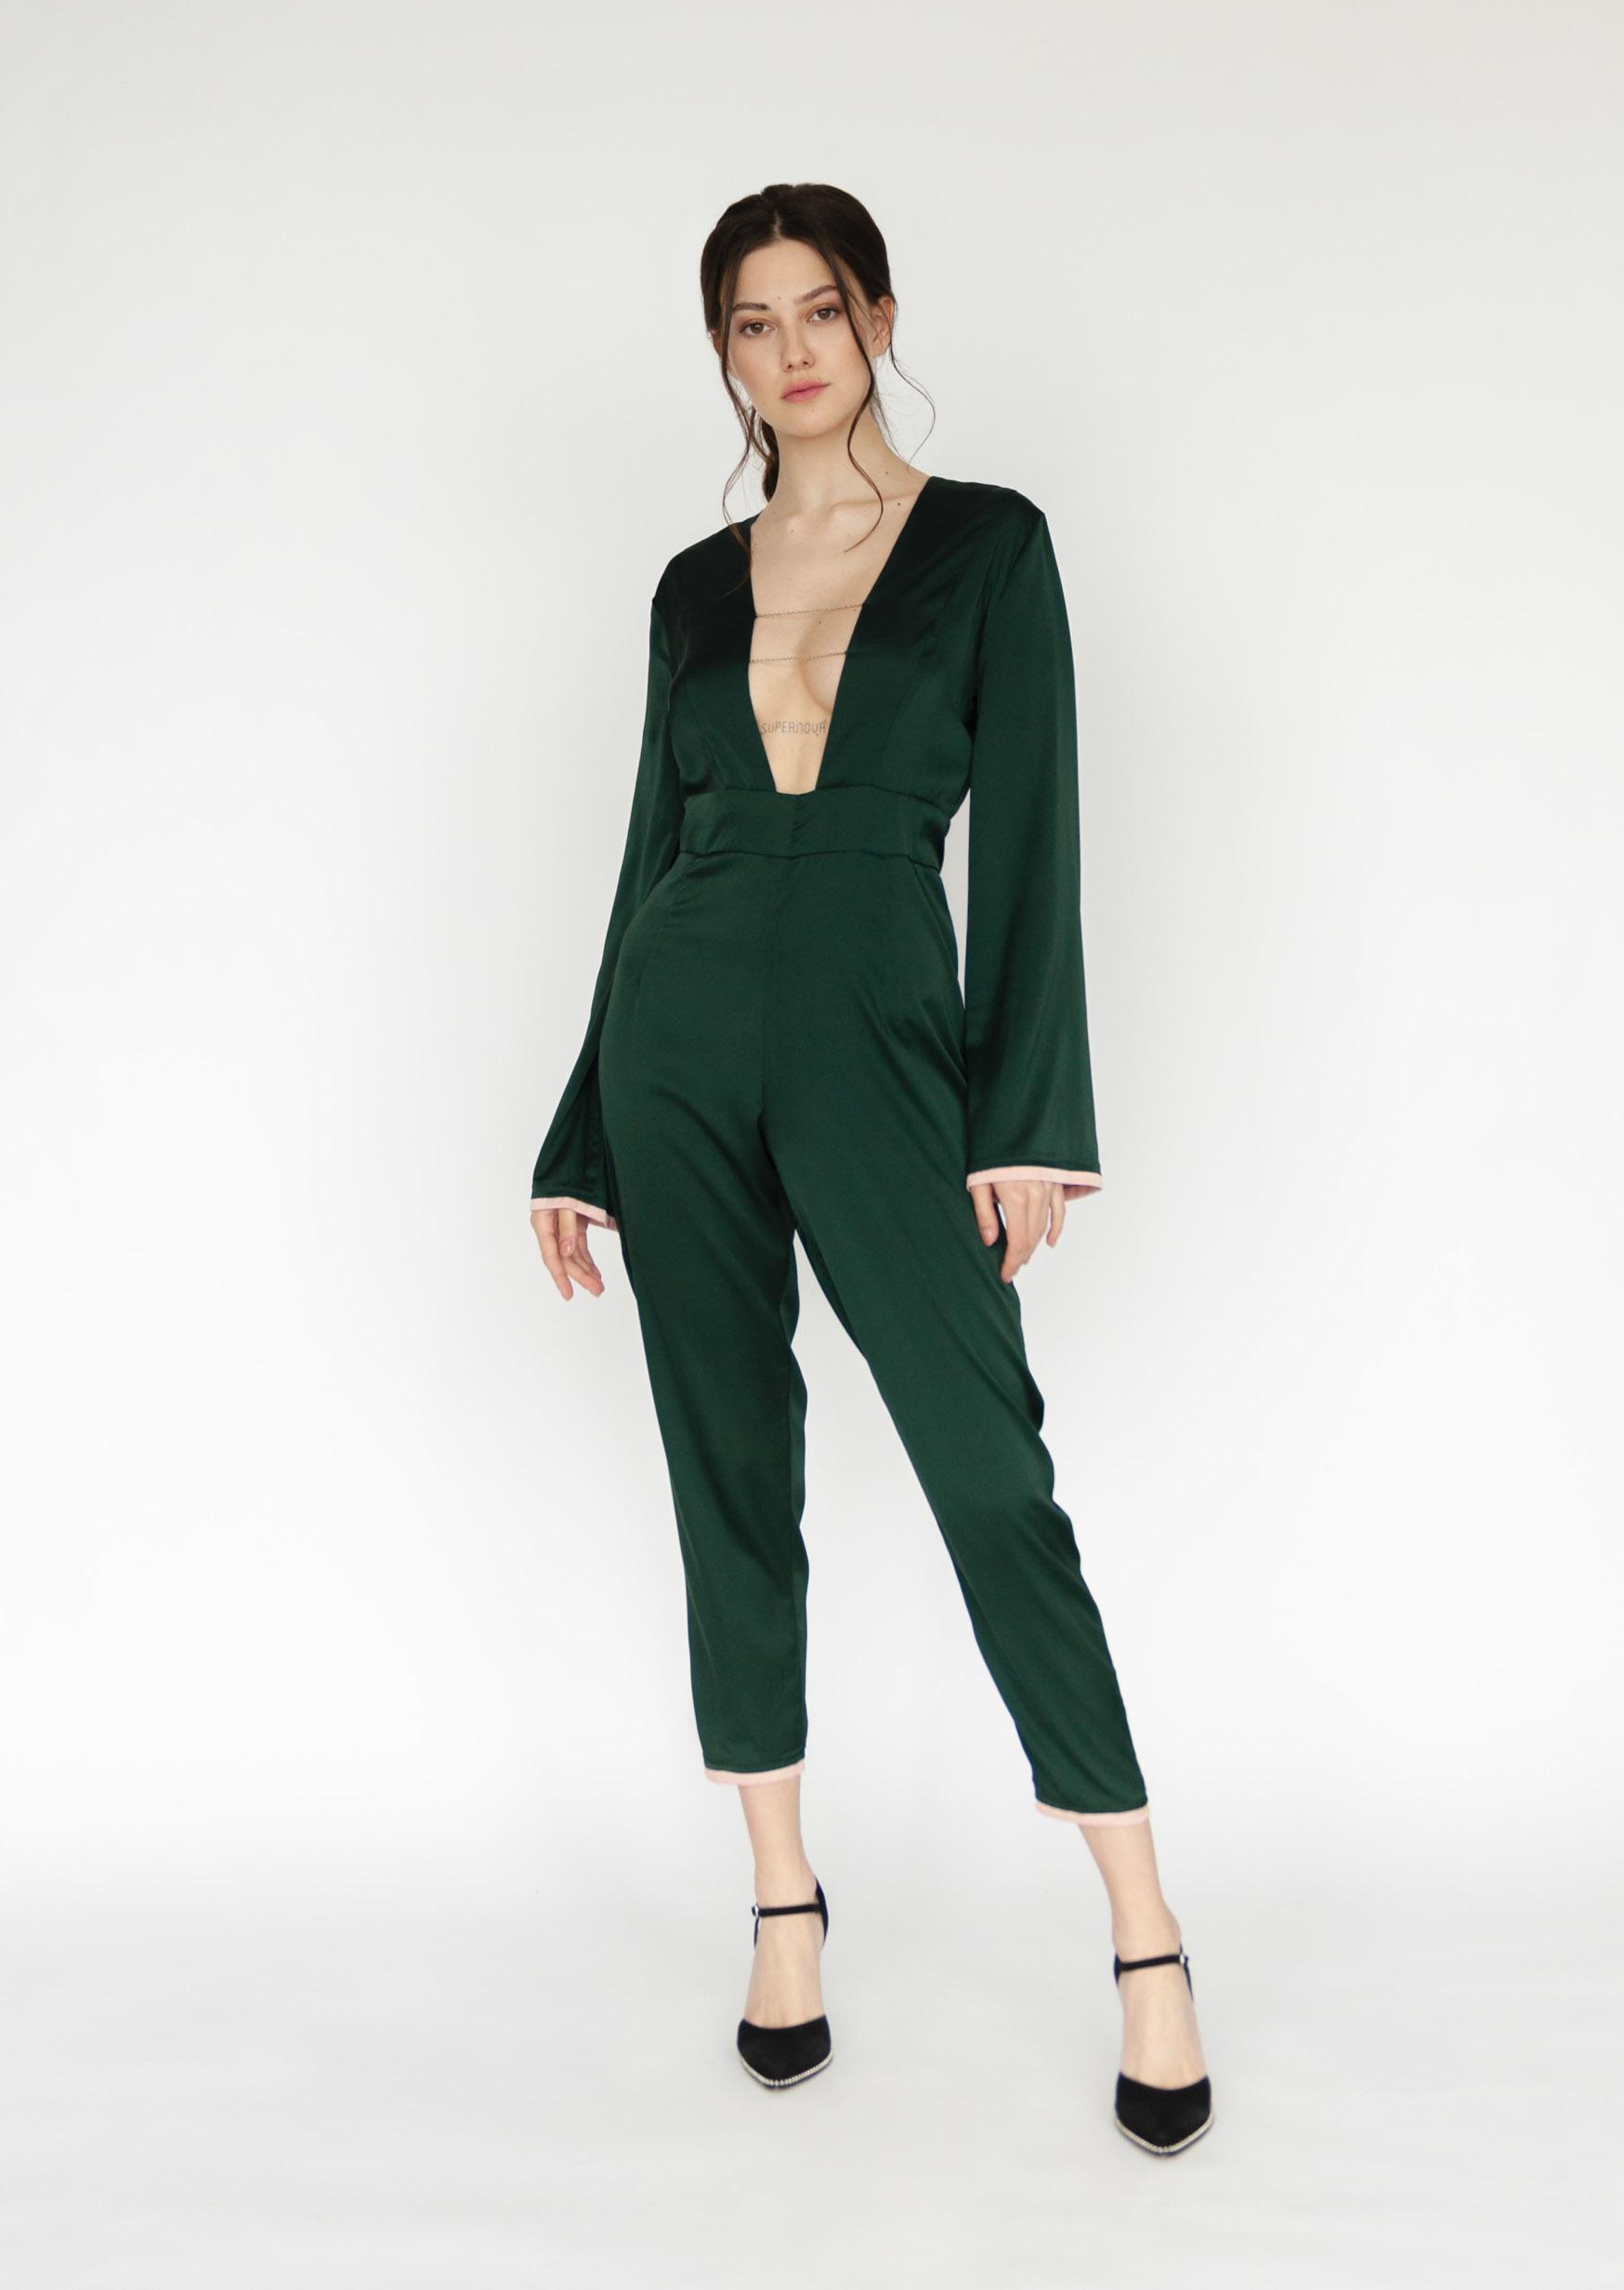 Emerald silk jumpsuit green sexy bodysuit with belt